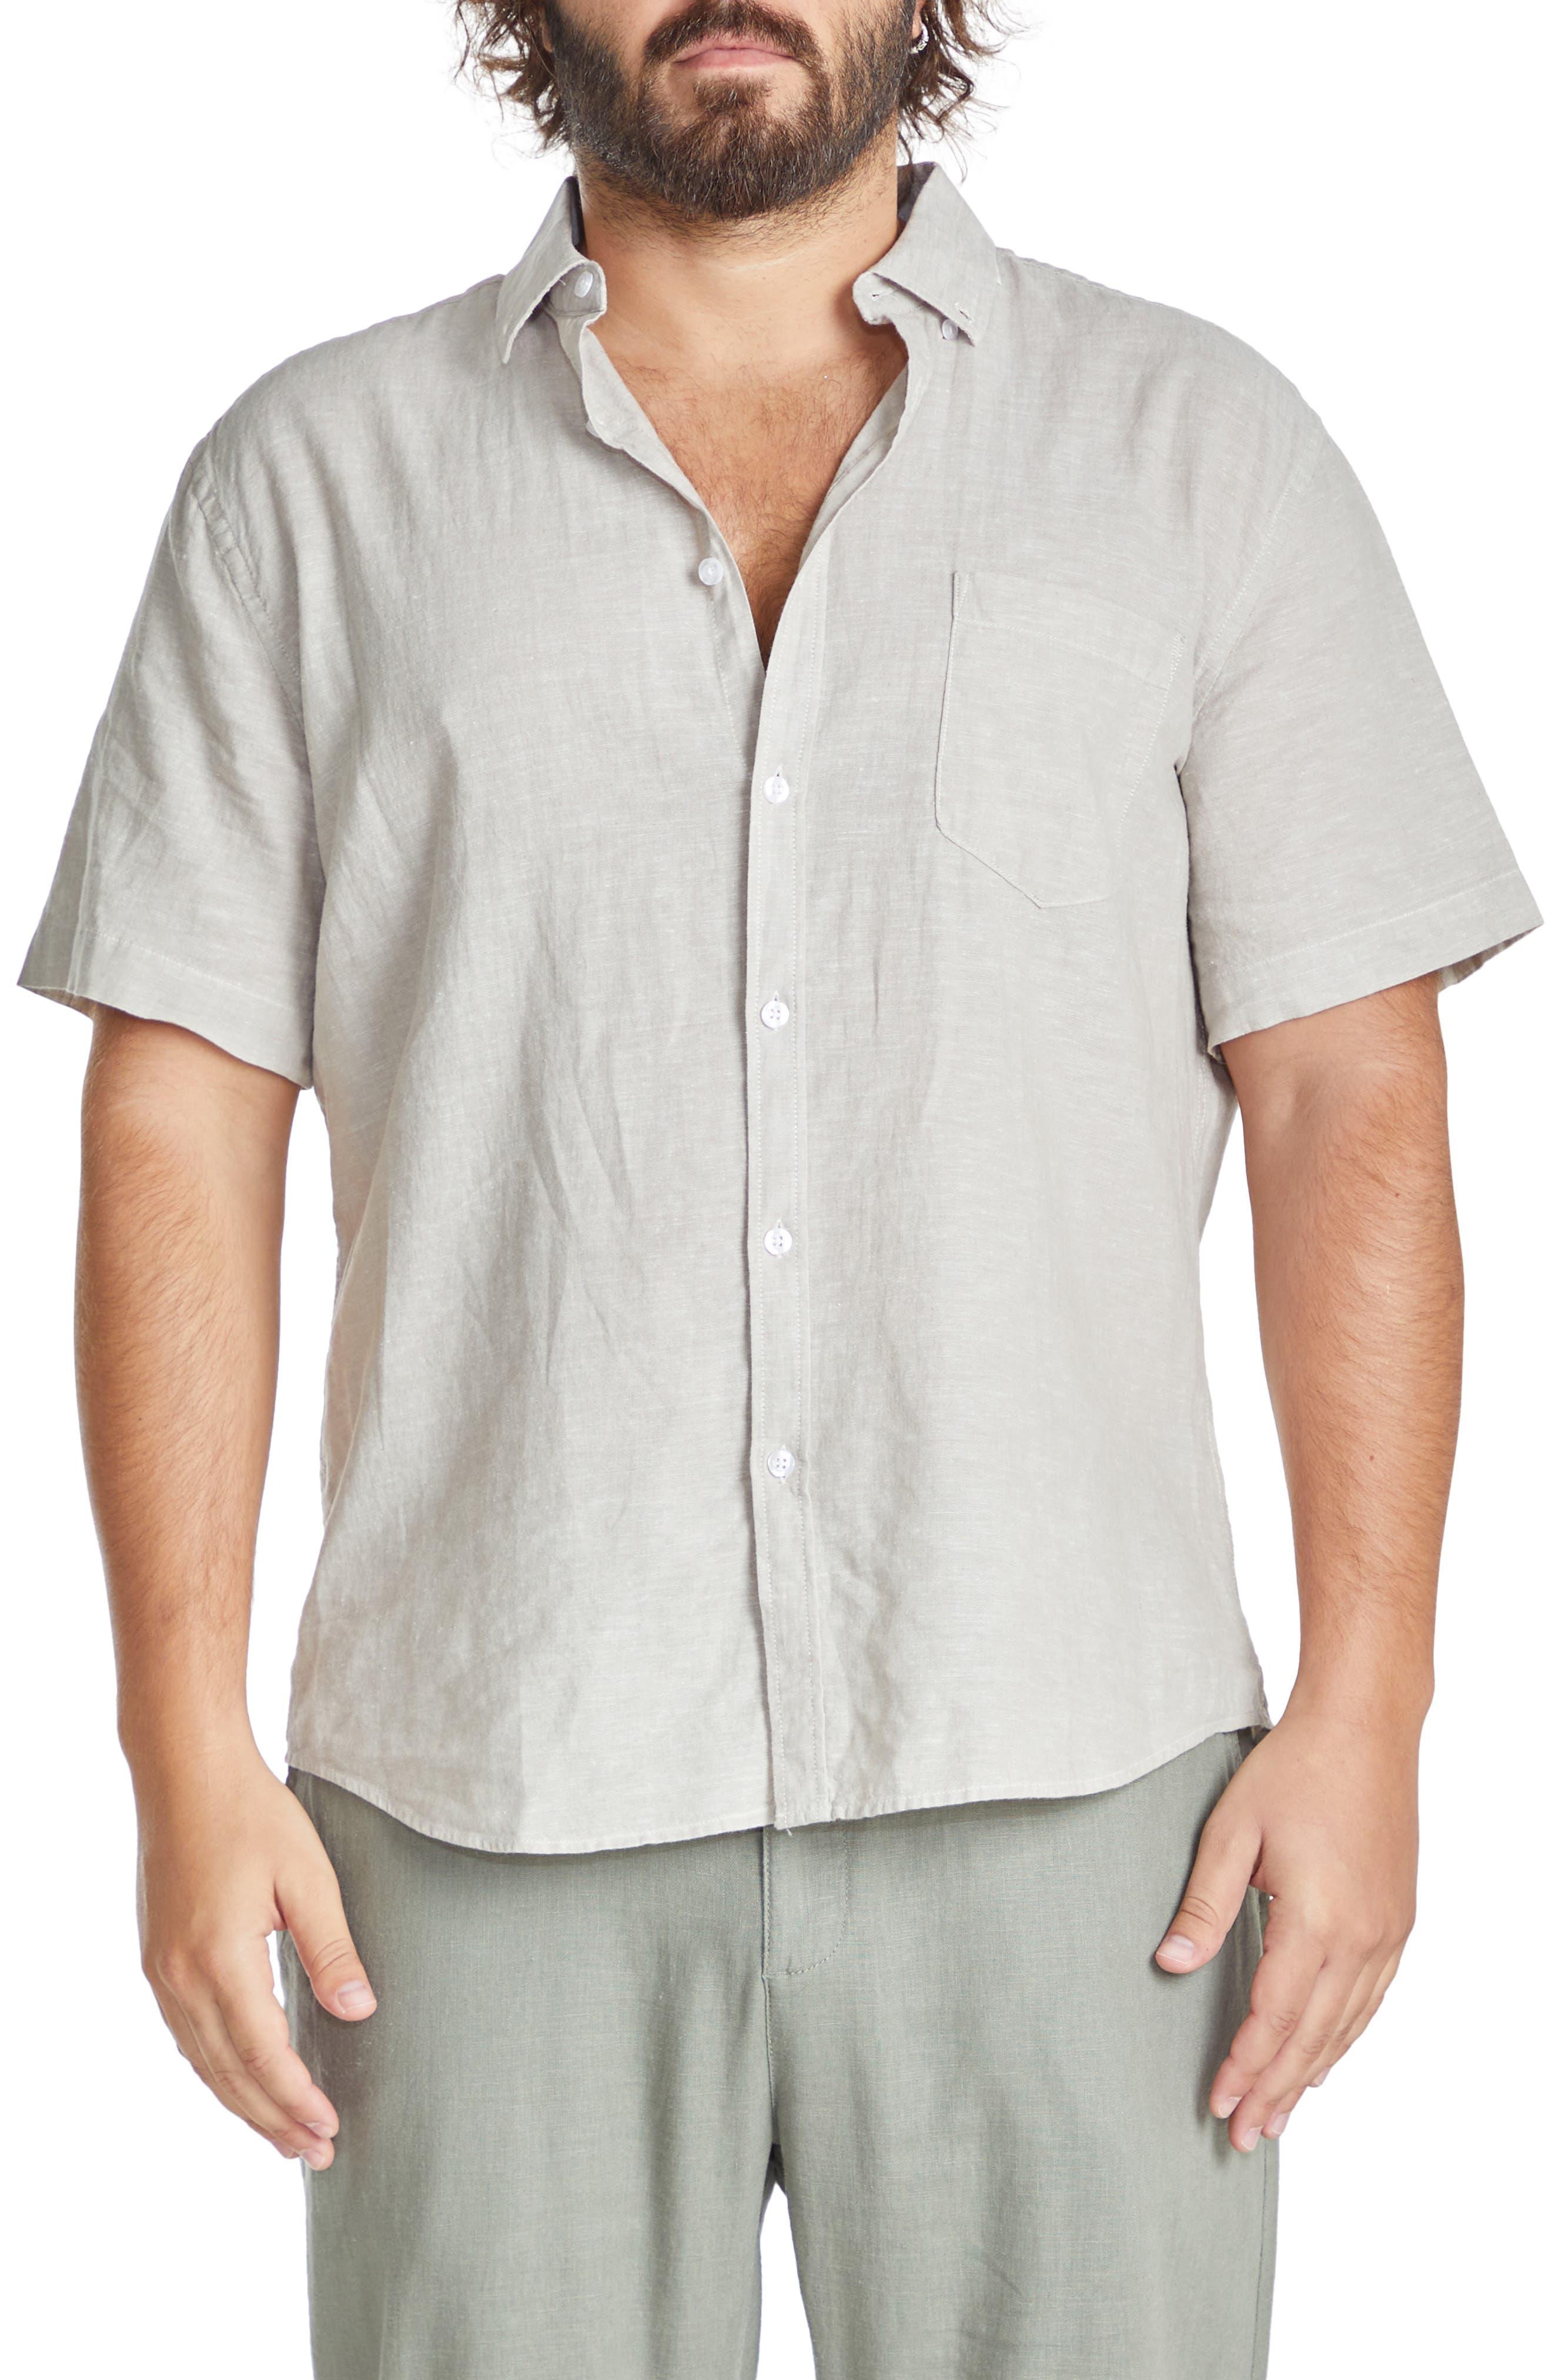 Tahiti Slub Short Sleeve Linen Blend Button-Down Shirt